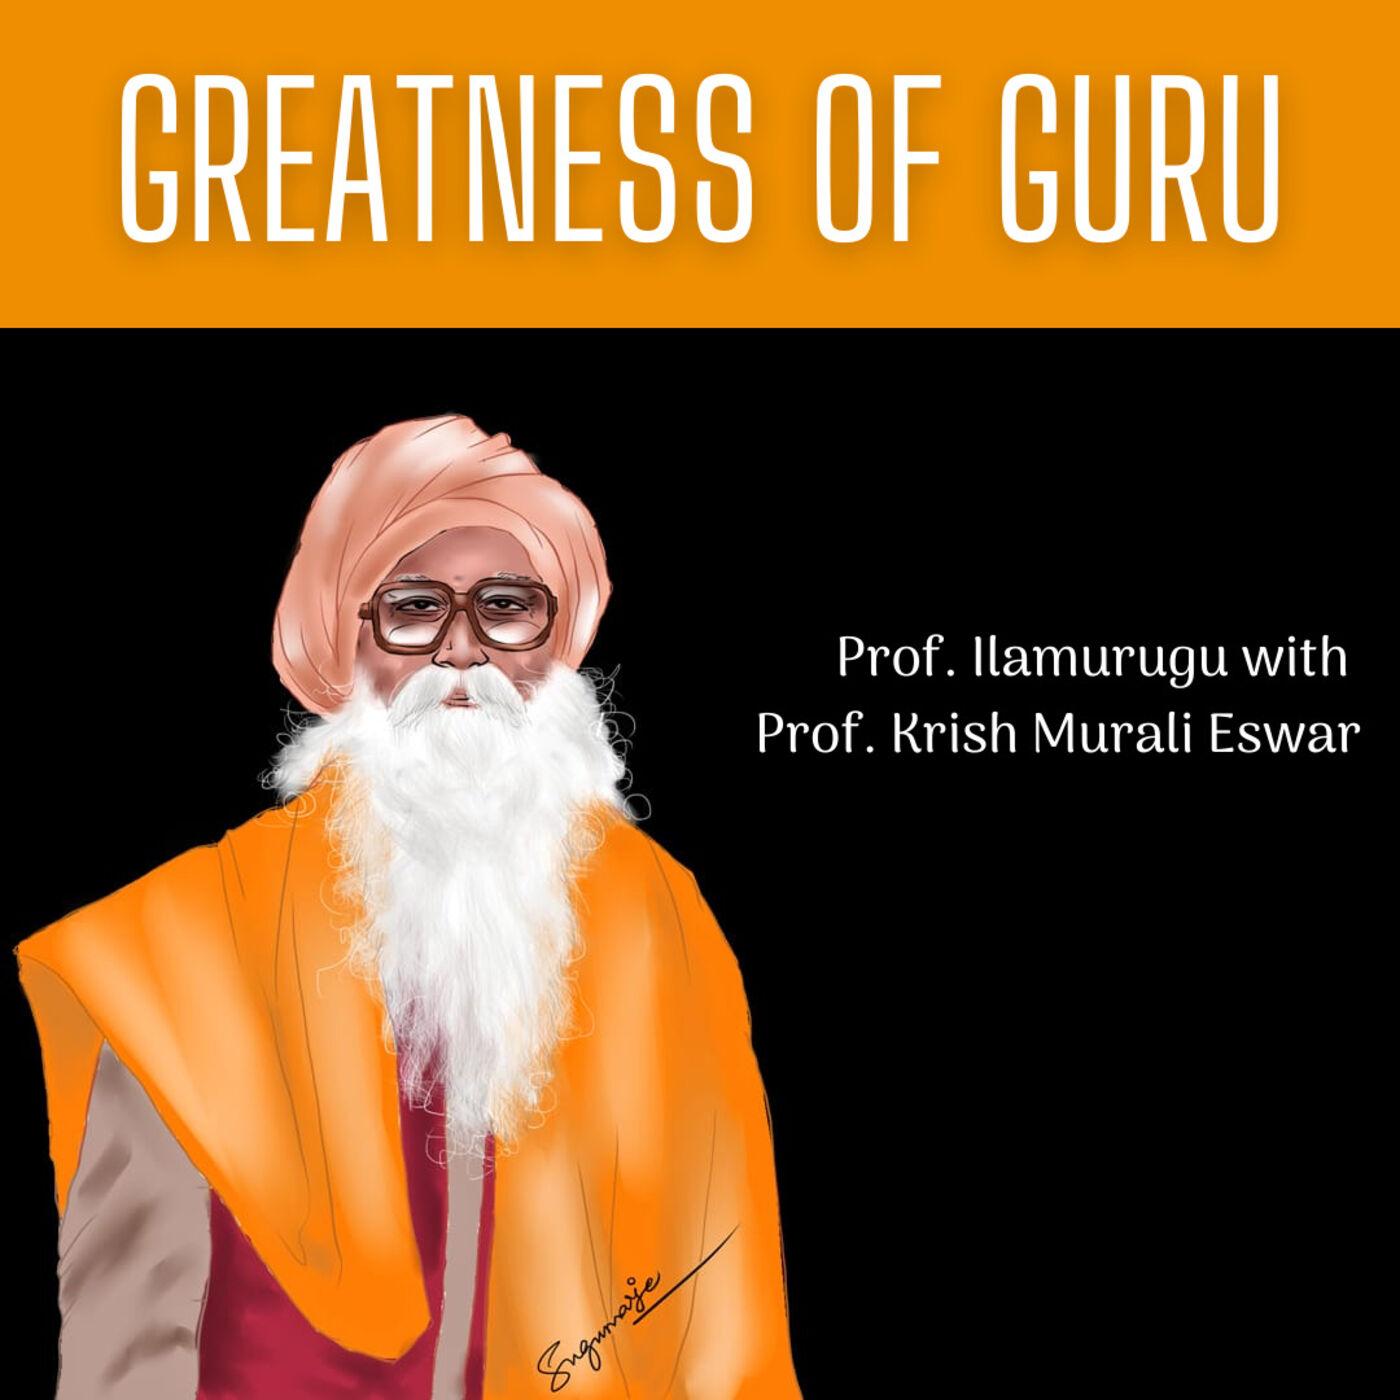 102 Greatness of Guru - Live Conversation with Prof. Ilamurugu Sekar of Bahrain